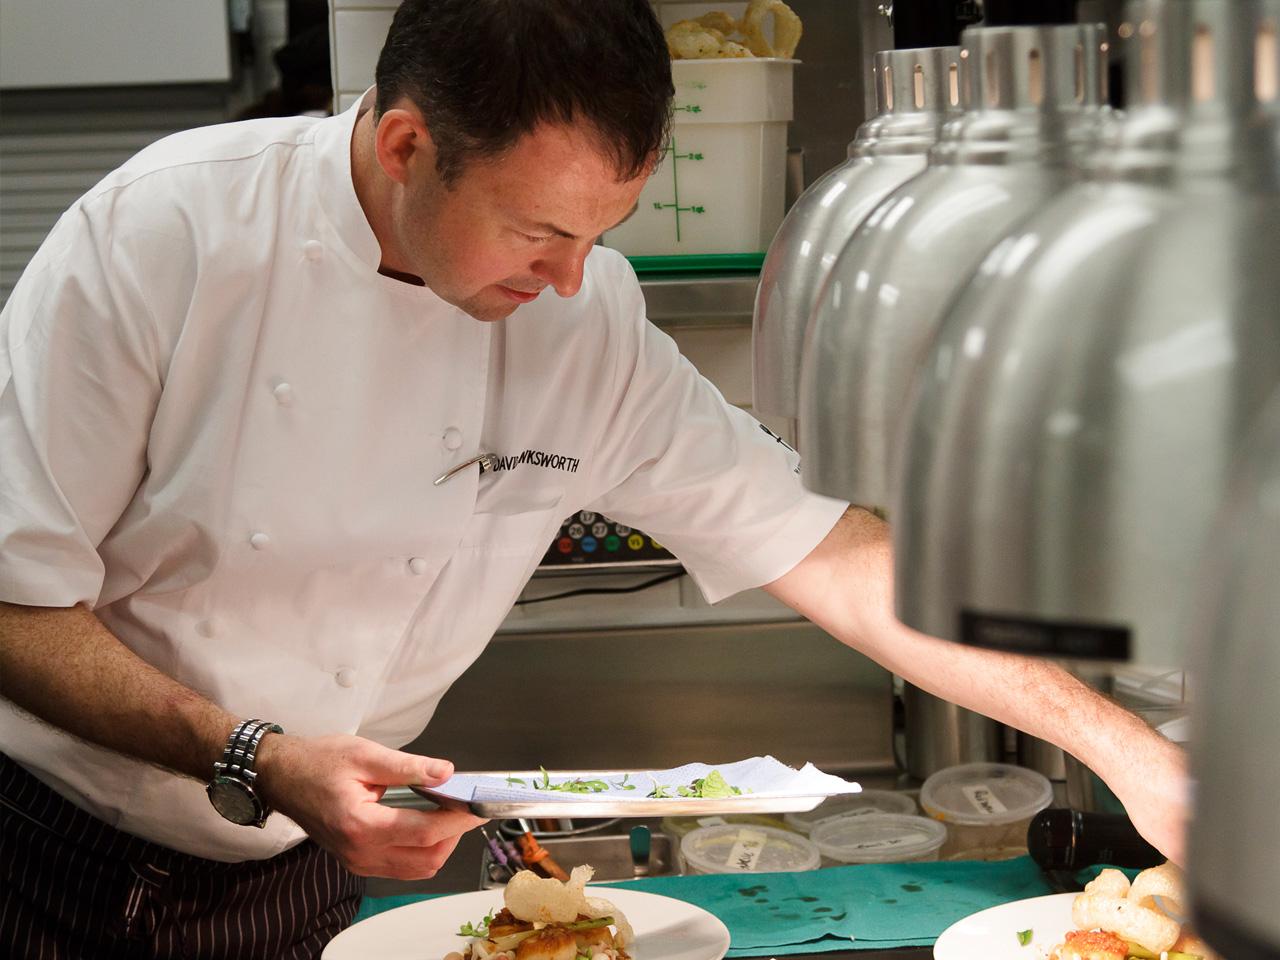 Vancouver Chef David Hawksworth Announces Upcoming Second Restaurant